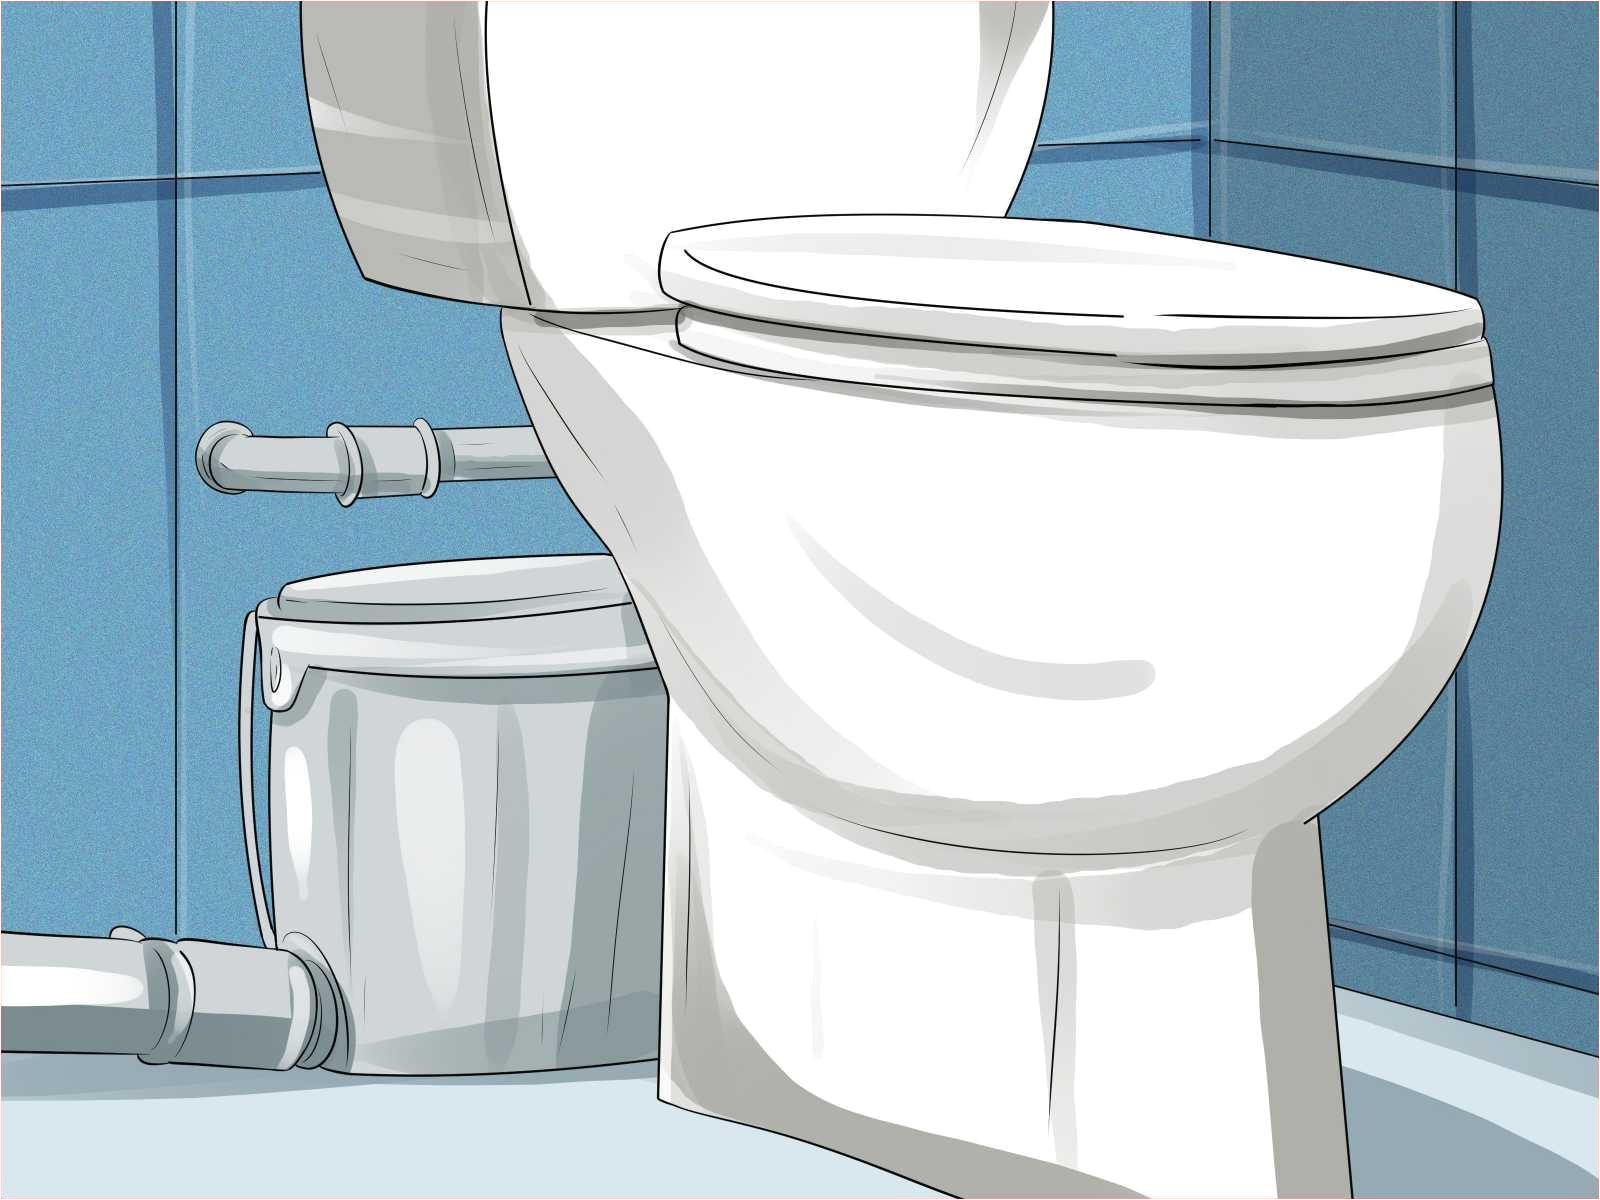 bathtub reglazing nj inspirational shower drain plumbing elegant 0d grace place barnegat njbathtub reglazing nj most